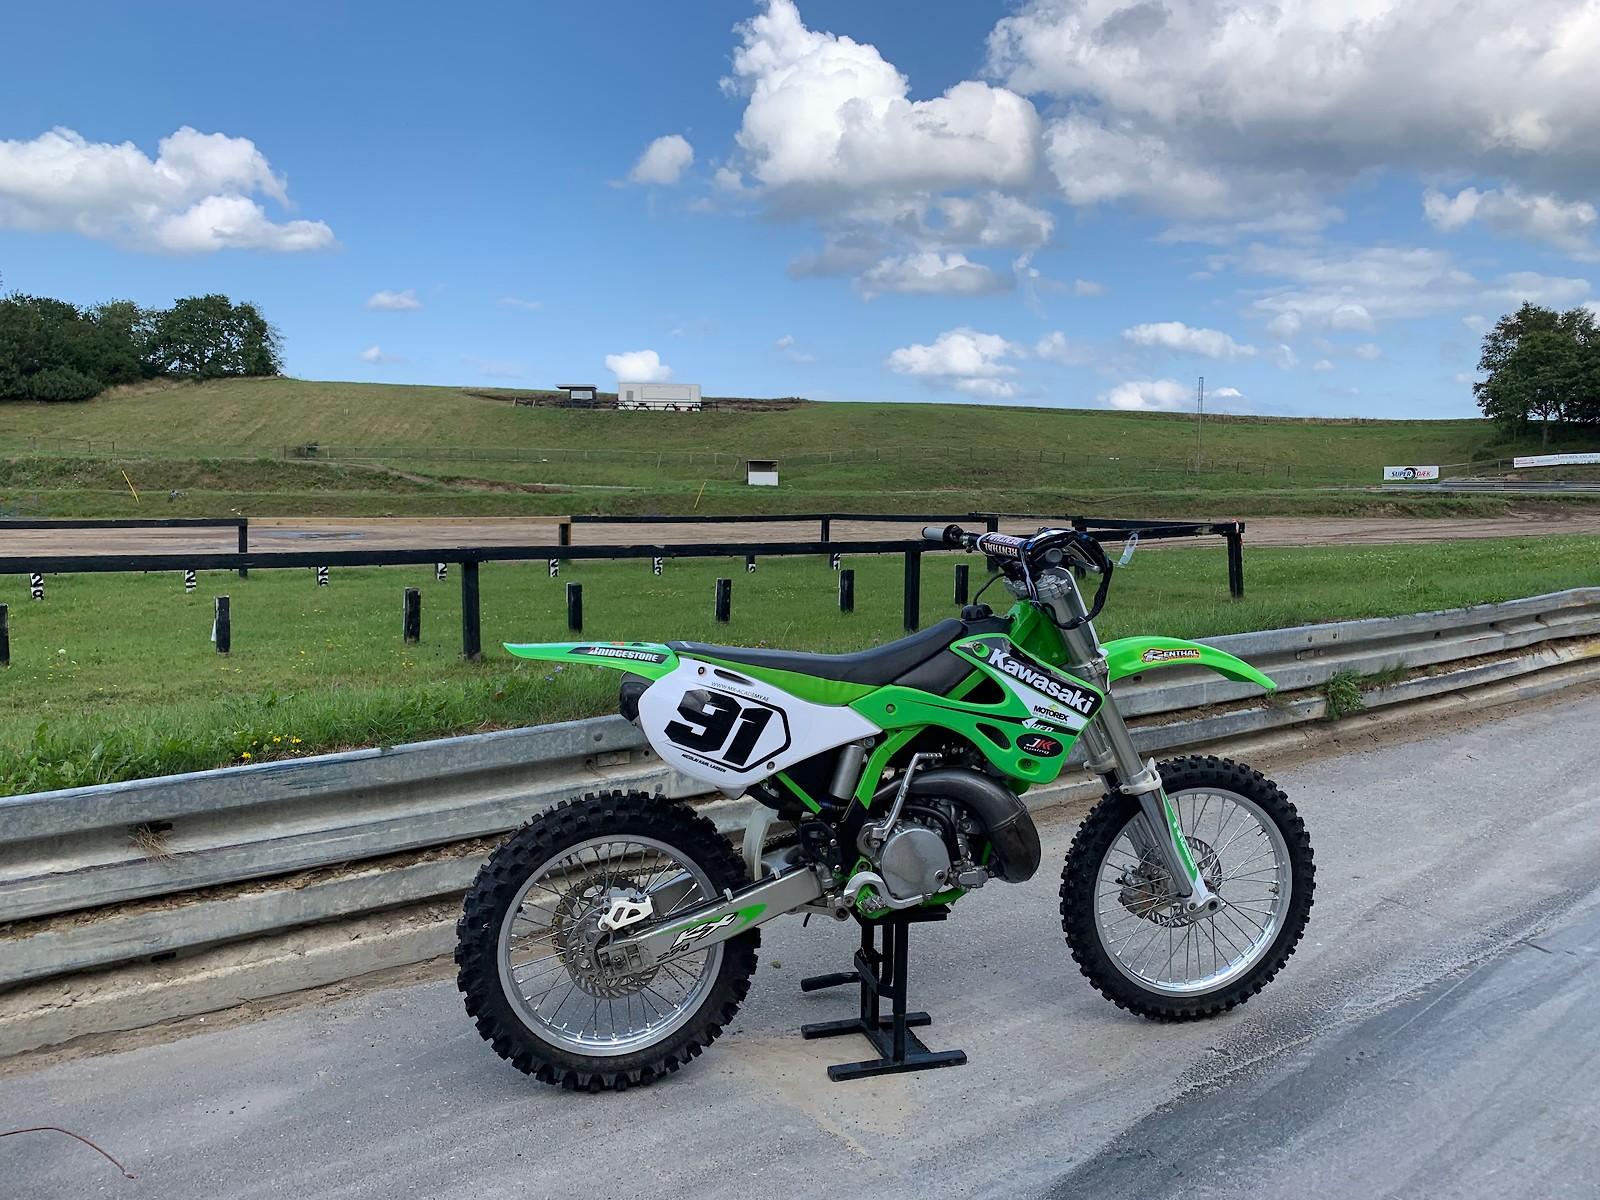 KX 250 1999